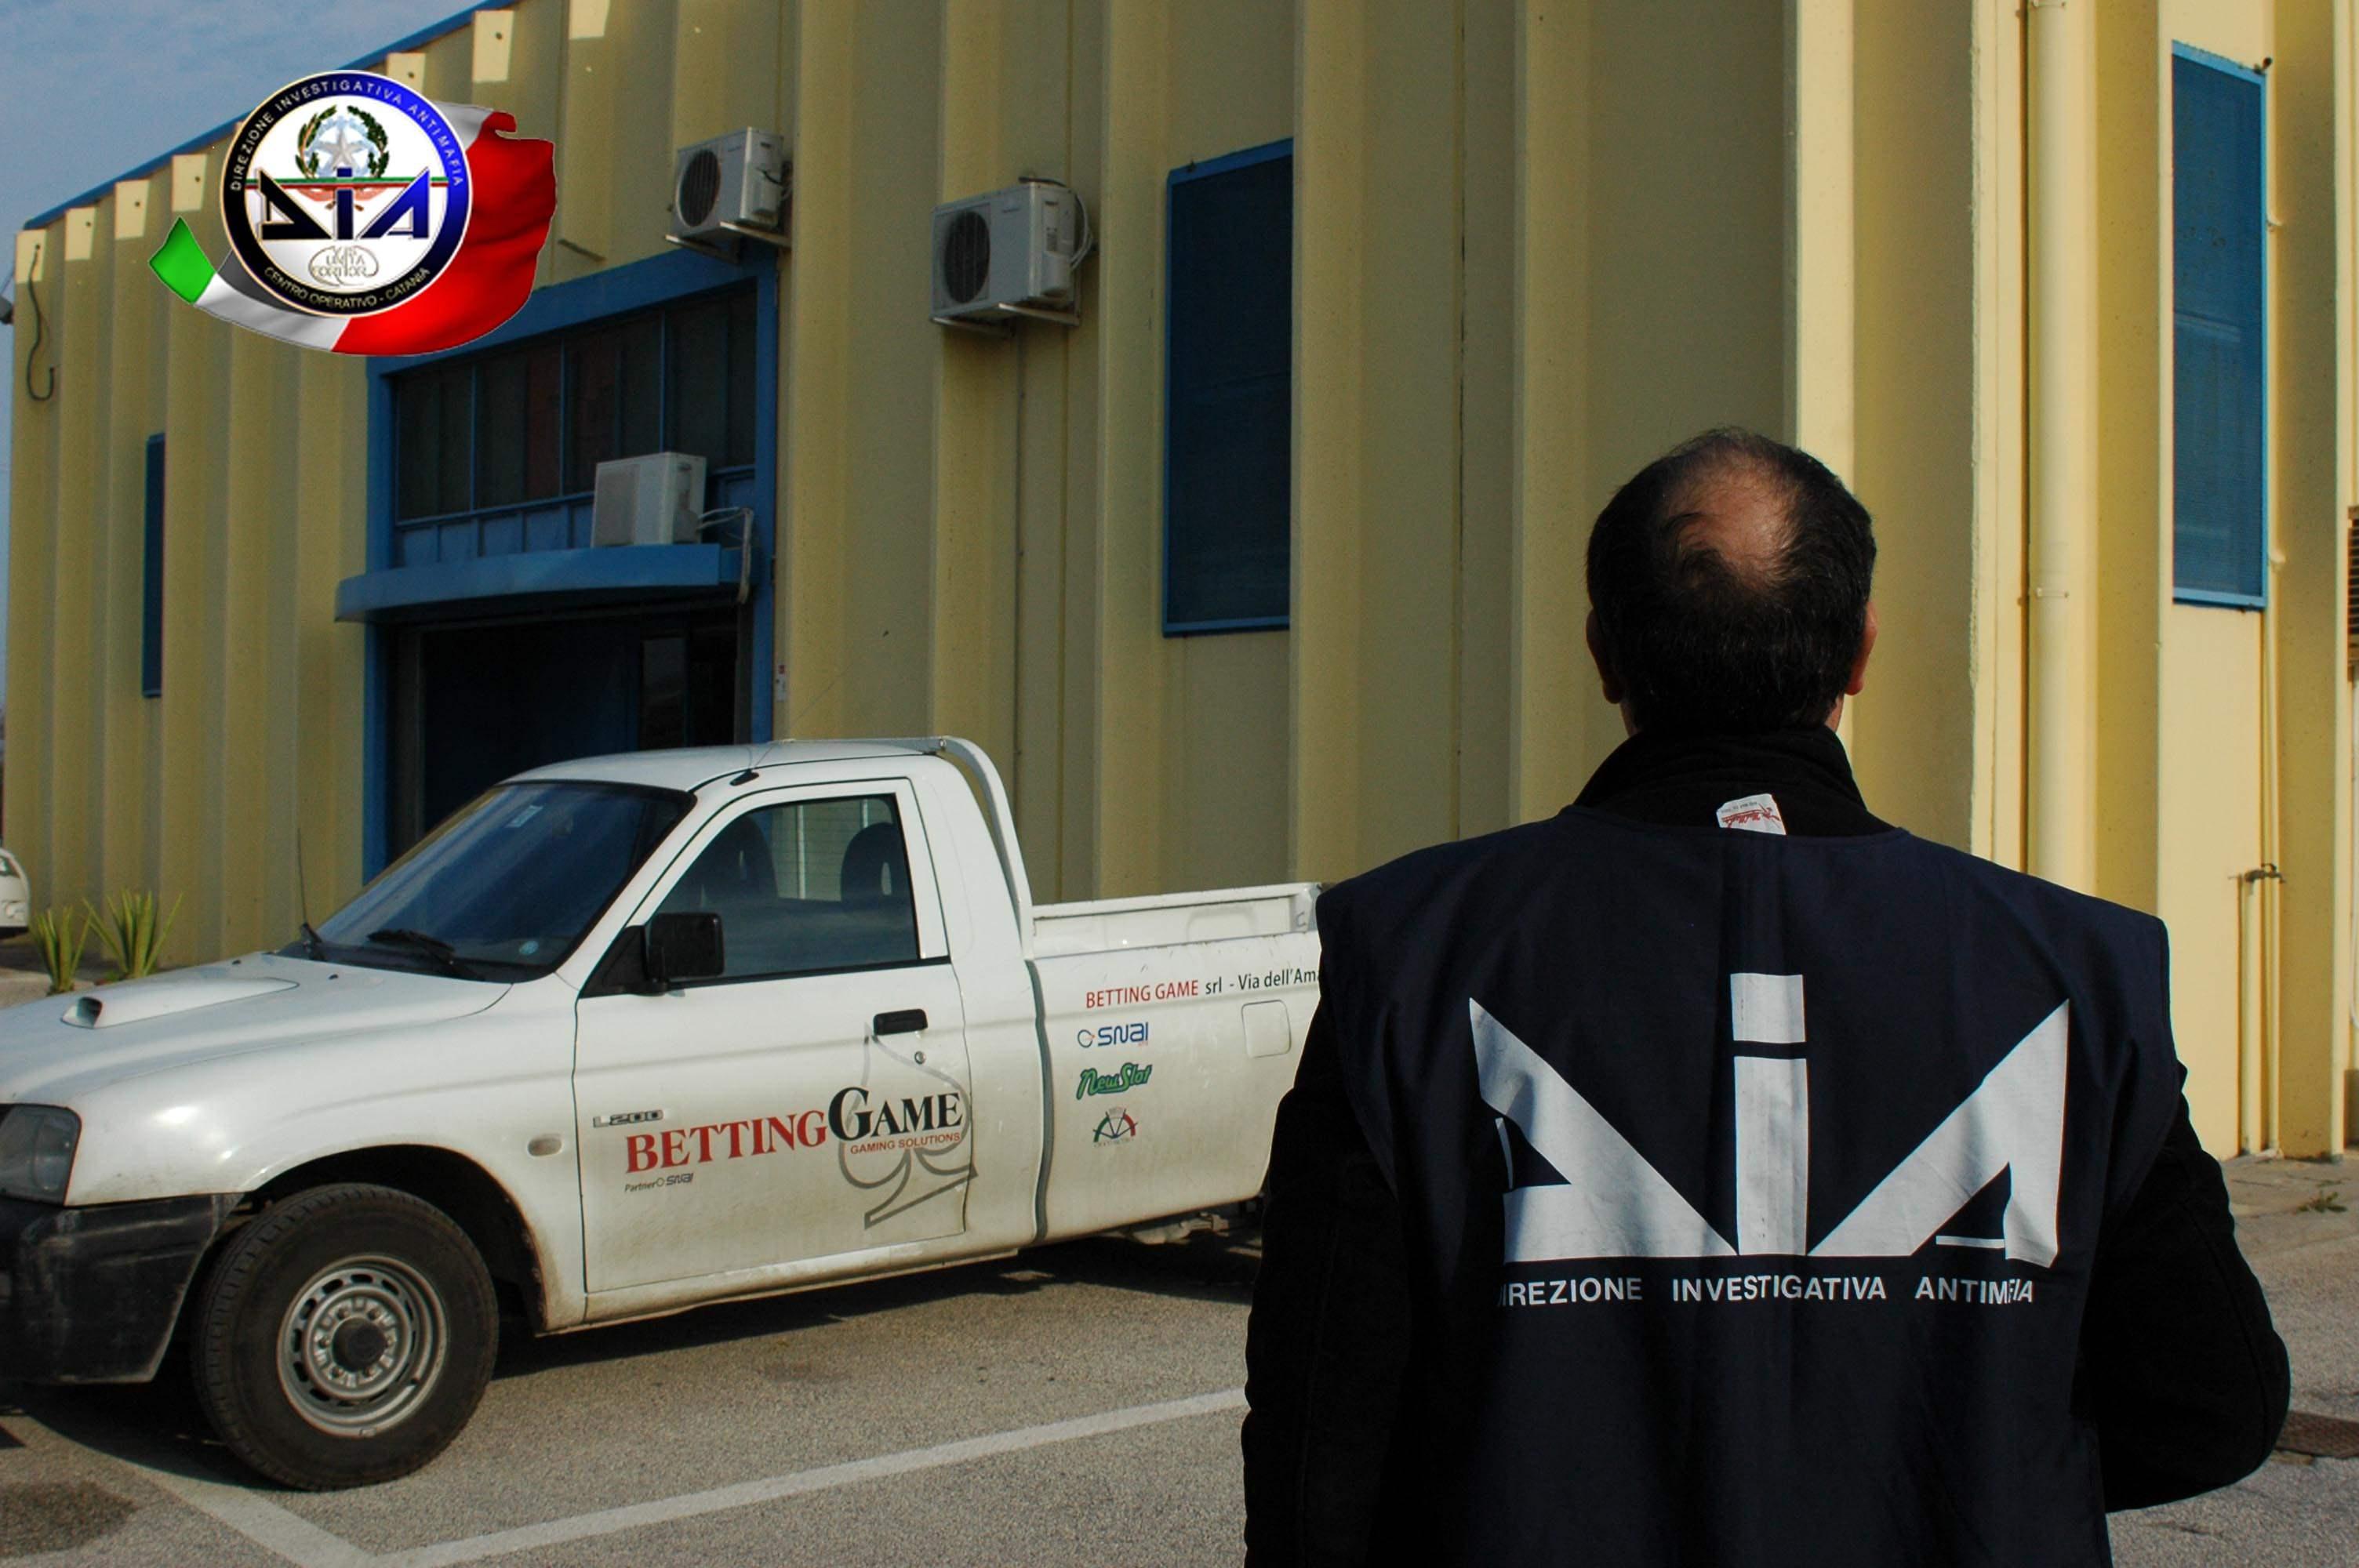 Mafia, confiscati beni a due imprenditori a Caltanissetta